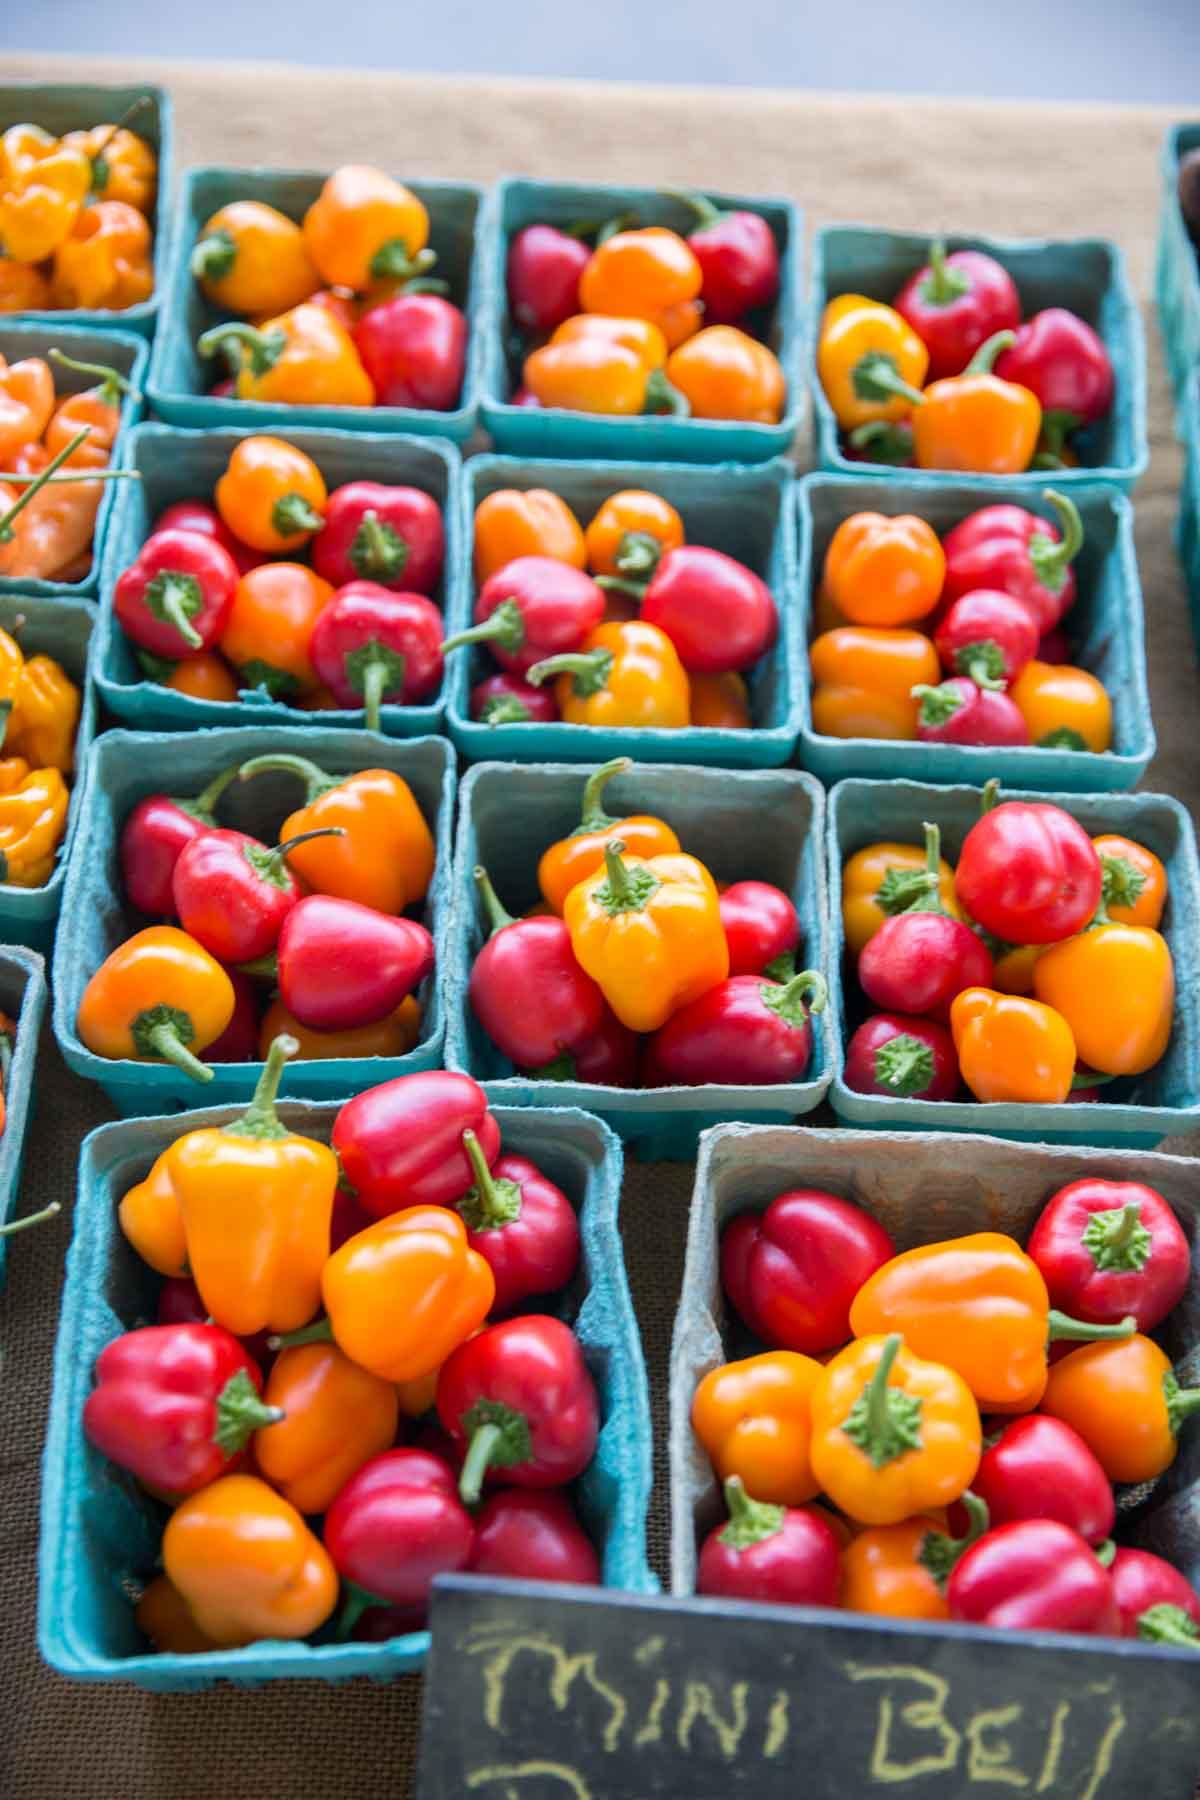 Durham Farmers Market bell peppers